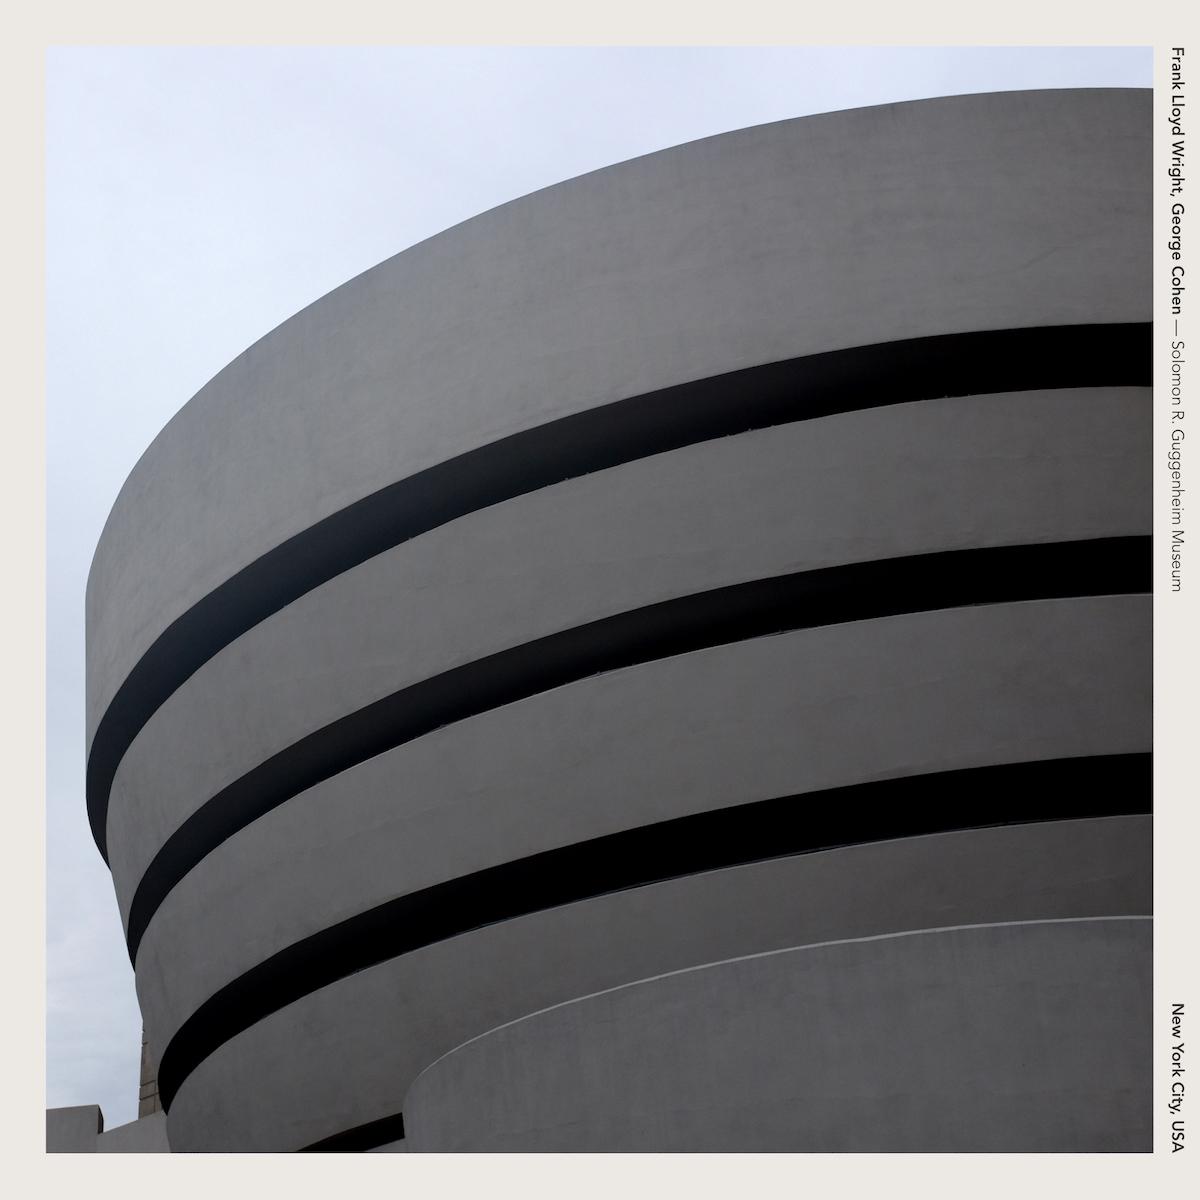 Frank Lloyd Wright & George Cohen — Solomon R. Guggenheim Museum